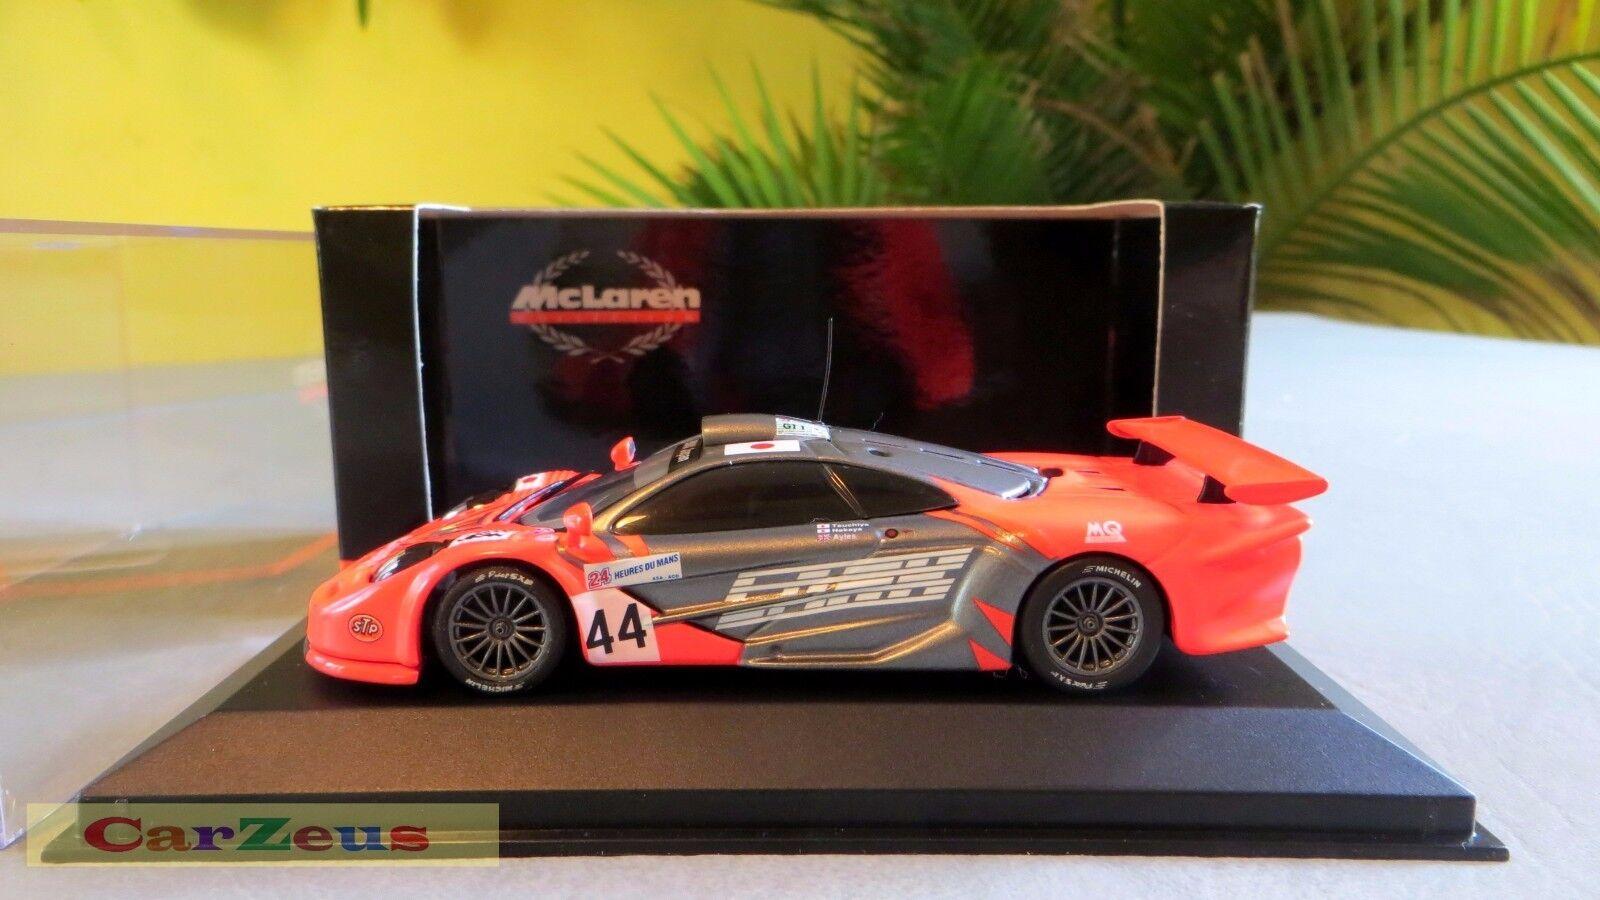 1 43 Minichamps McLaren McLaren McLaren F1 GTR Long Tail, 24hr Le Mans 1997 Team LARK 1bd359